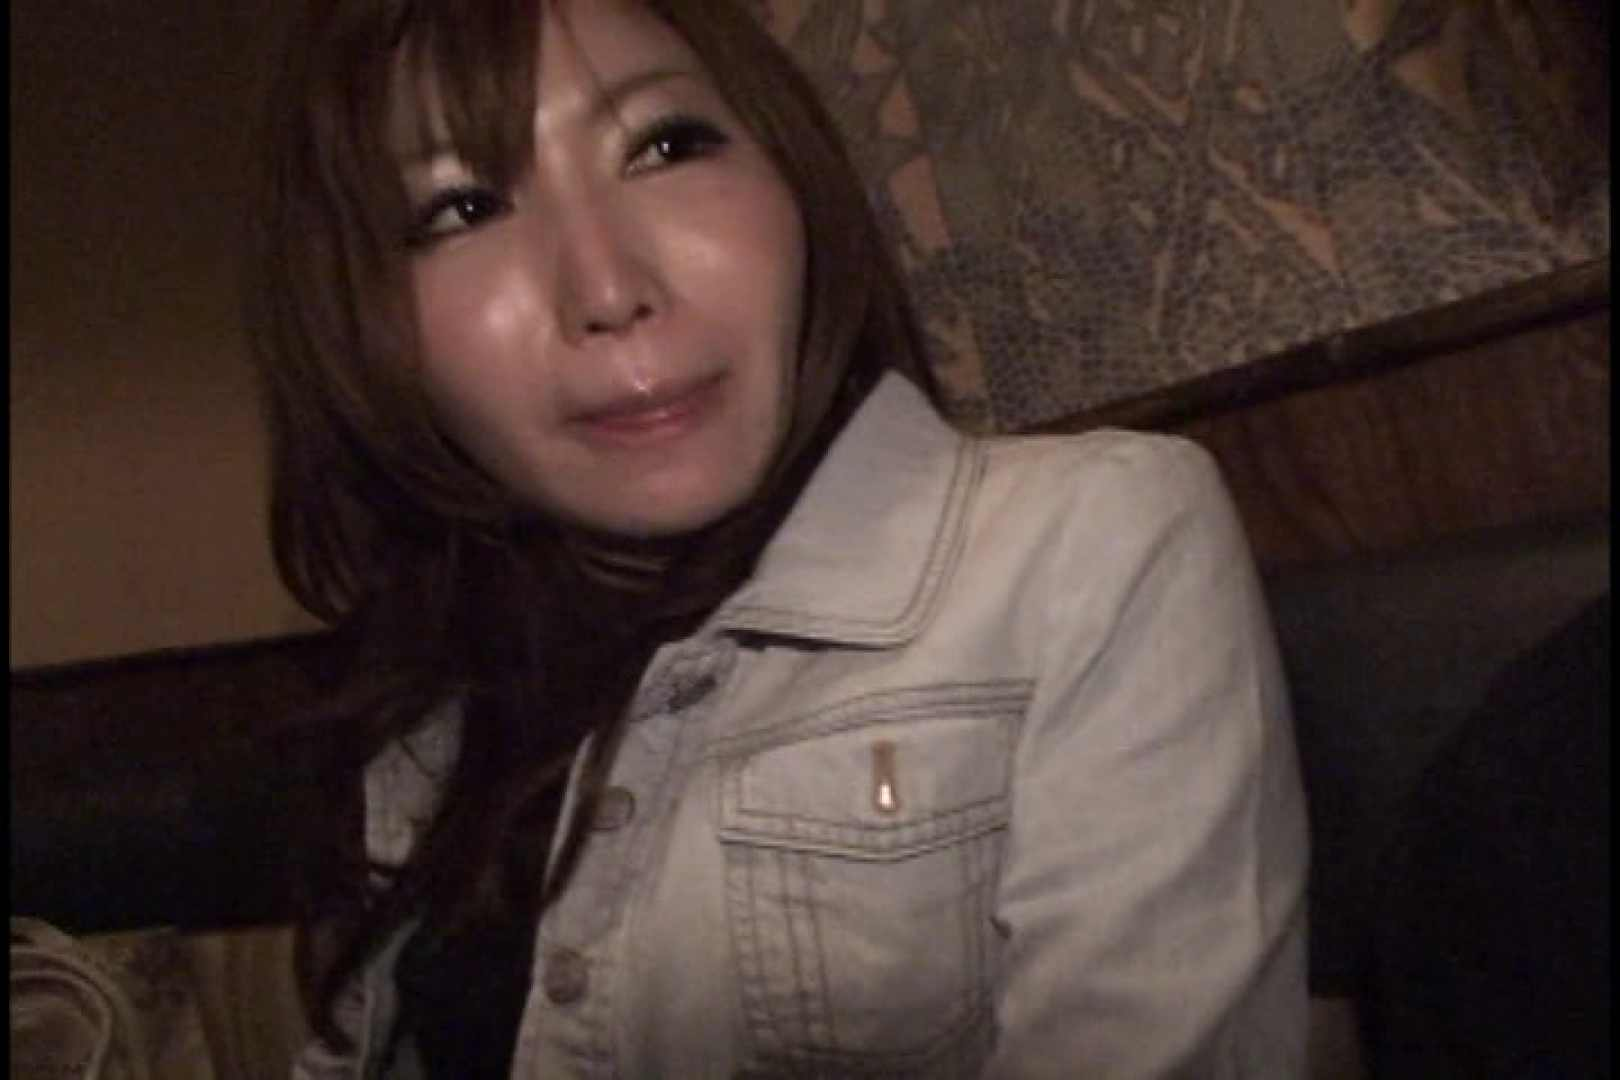 JDハンター全国ツアー vol.042 後編 女子大生のエロ動画  104PIX 30